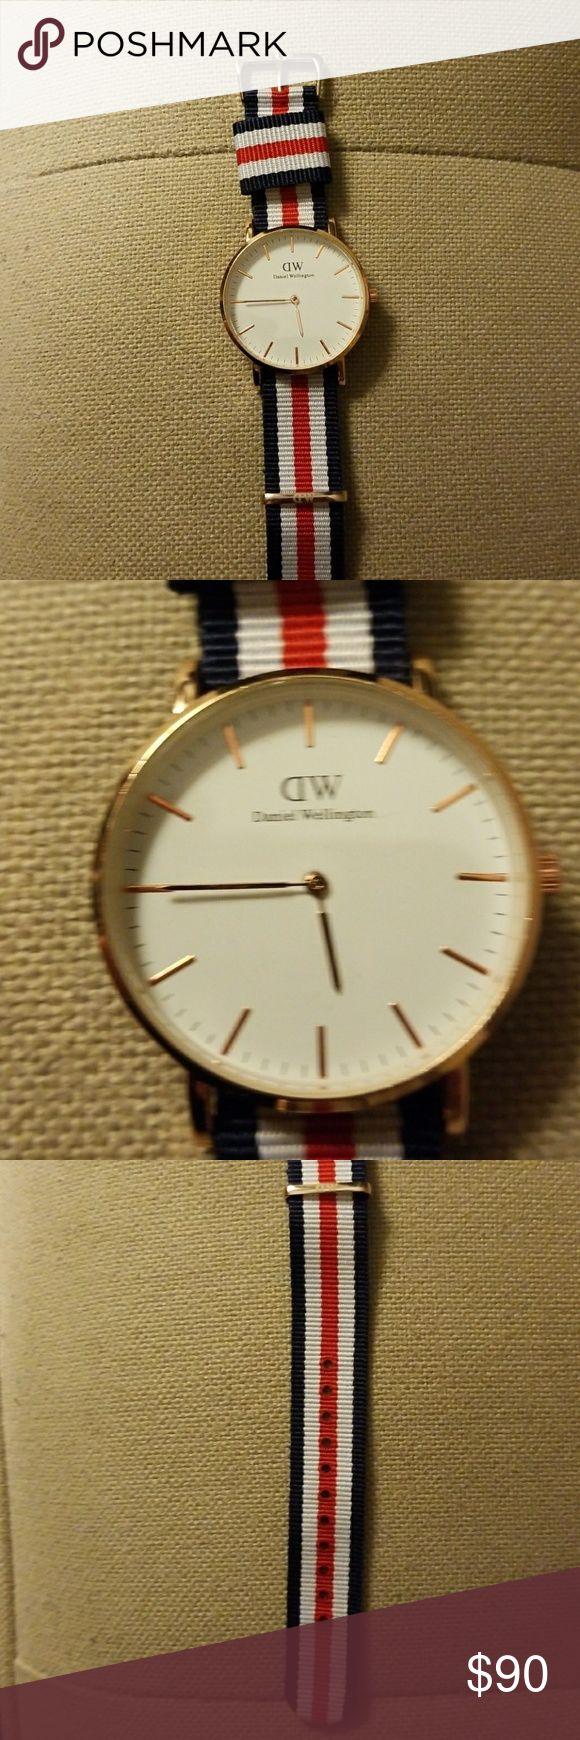 Daniel Wellington Watch Brand new Daniel Wellington Accessories Watches